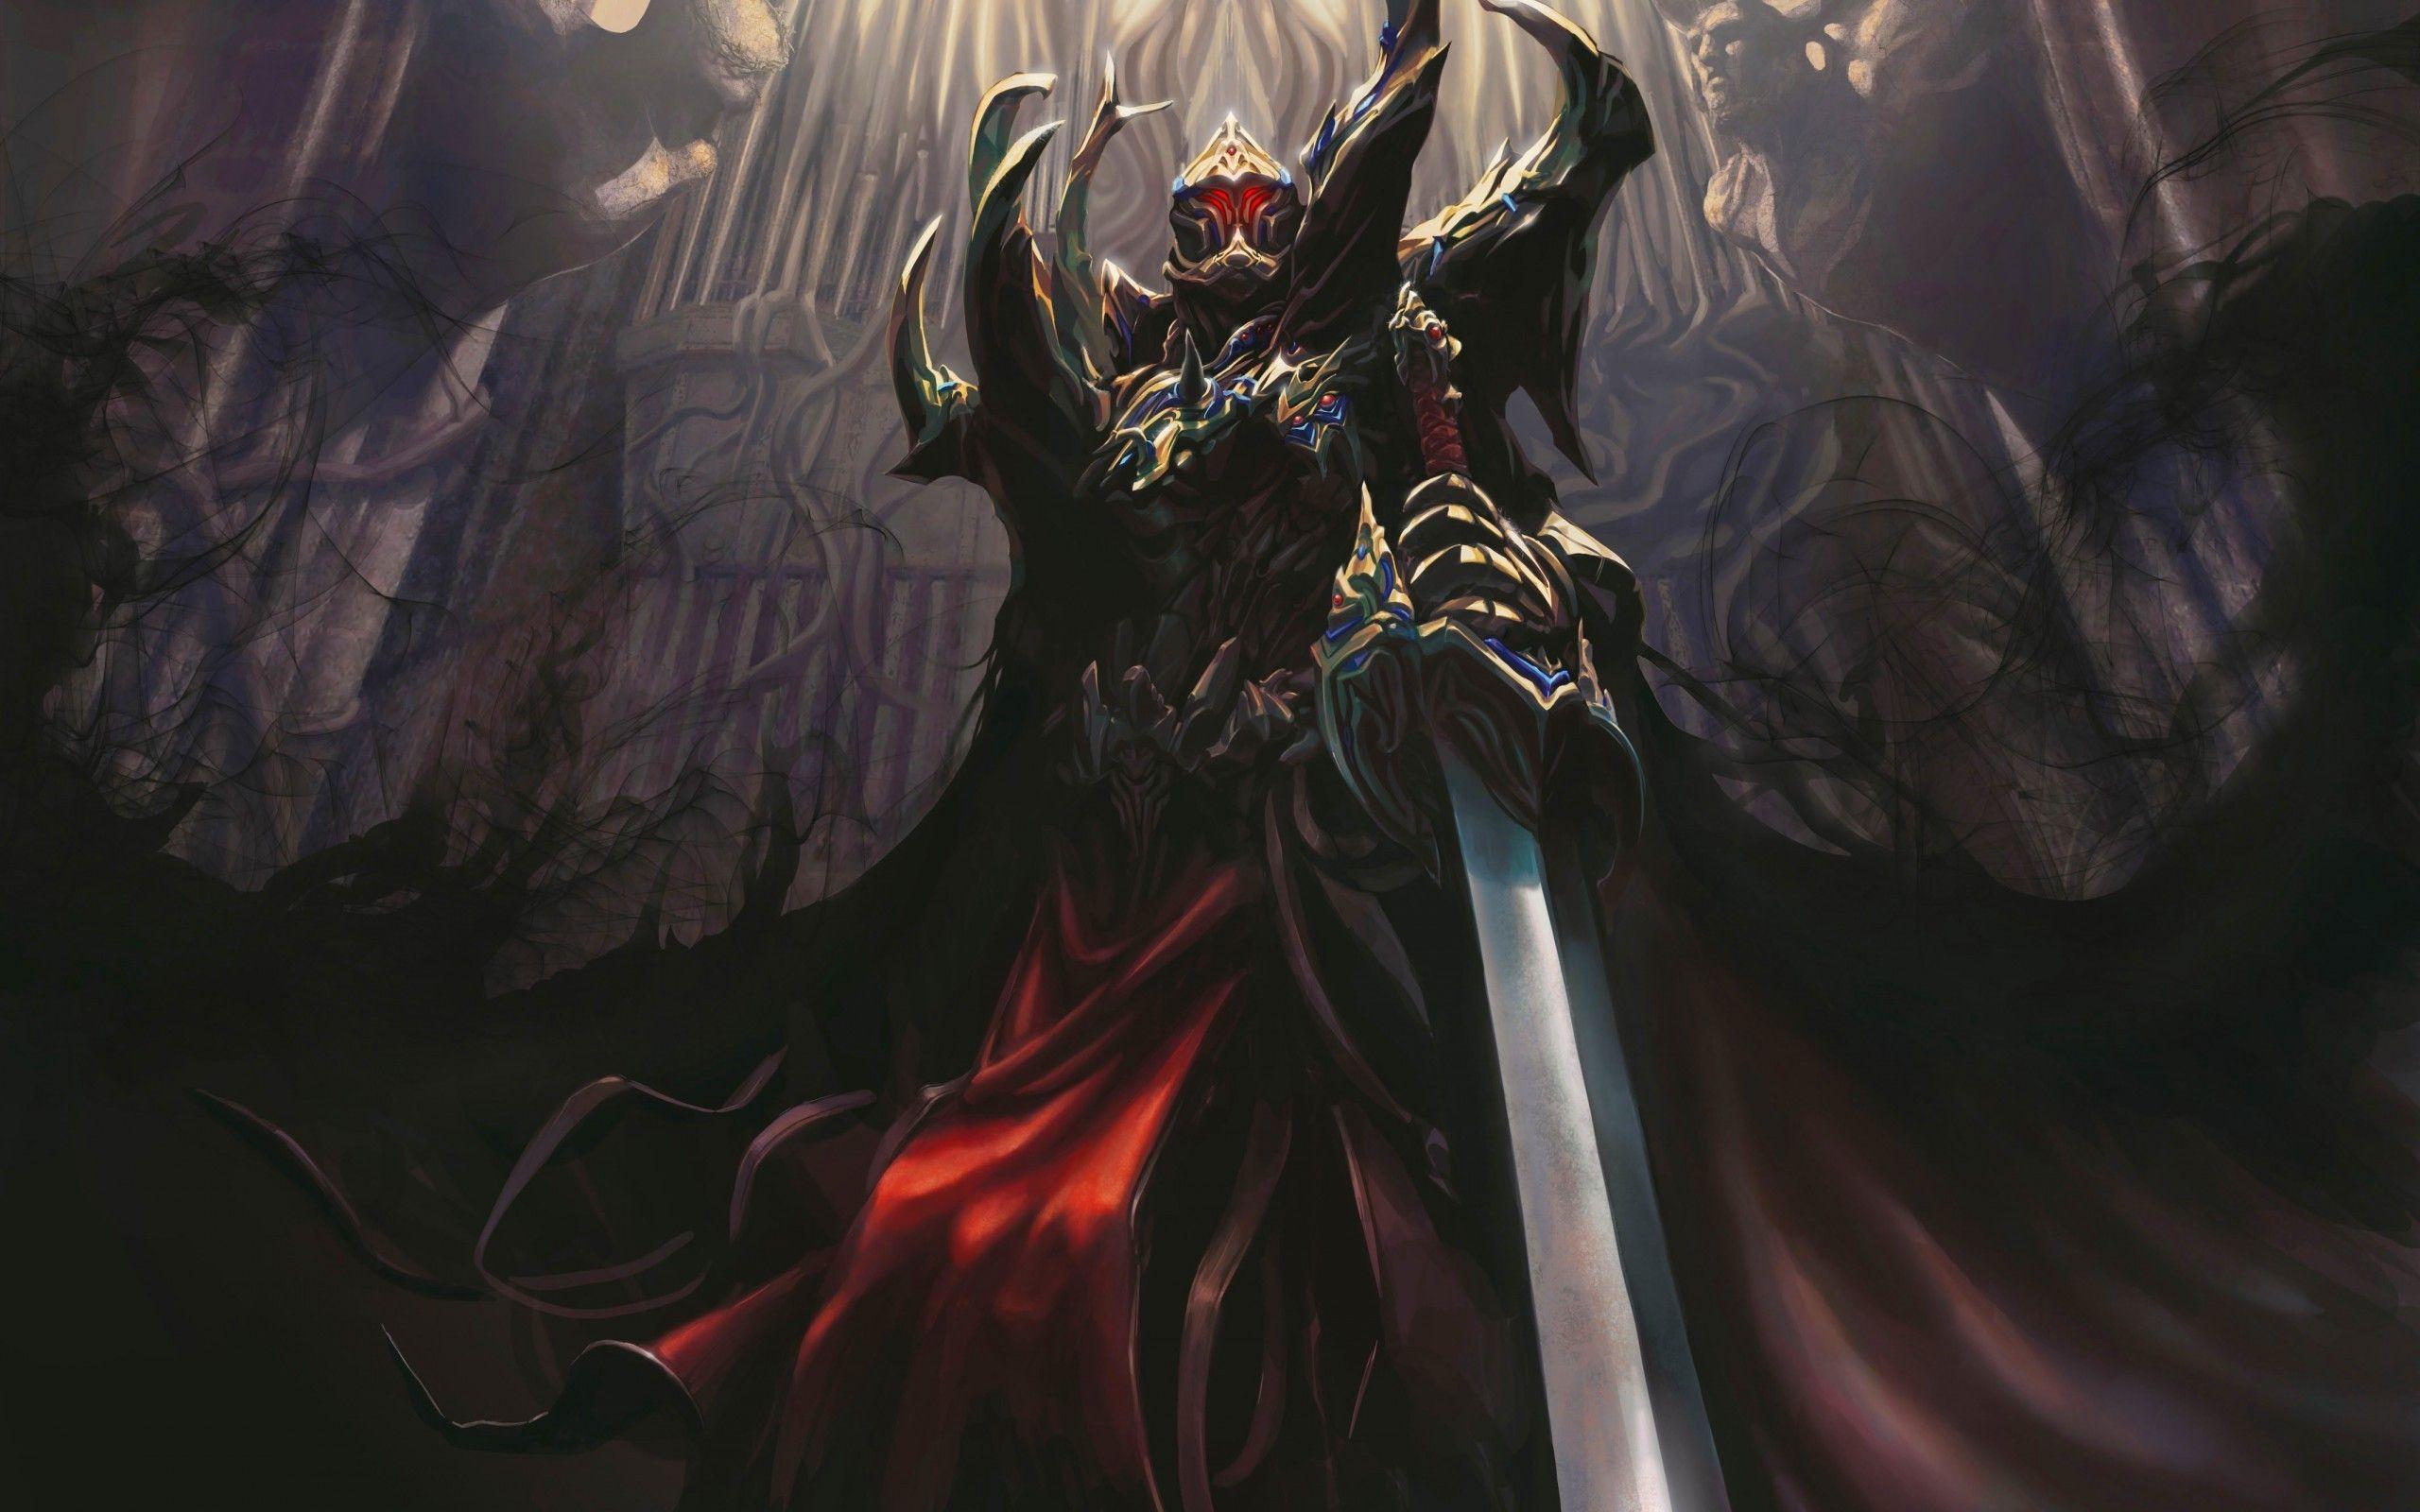 Death Dark Knights Shadows Fantasy Art Armor Artwork TagNotAllowedTooSubjective Swords 2560x1600 Wallpaper